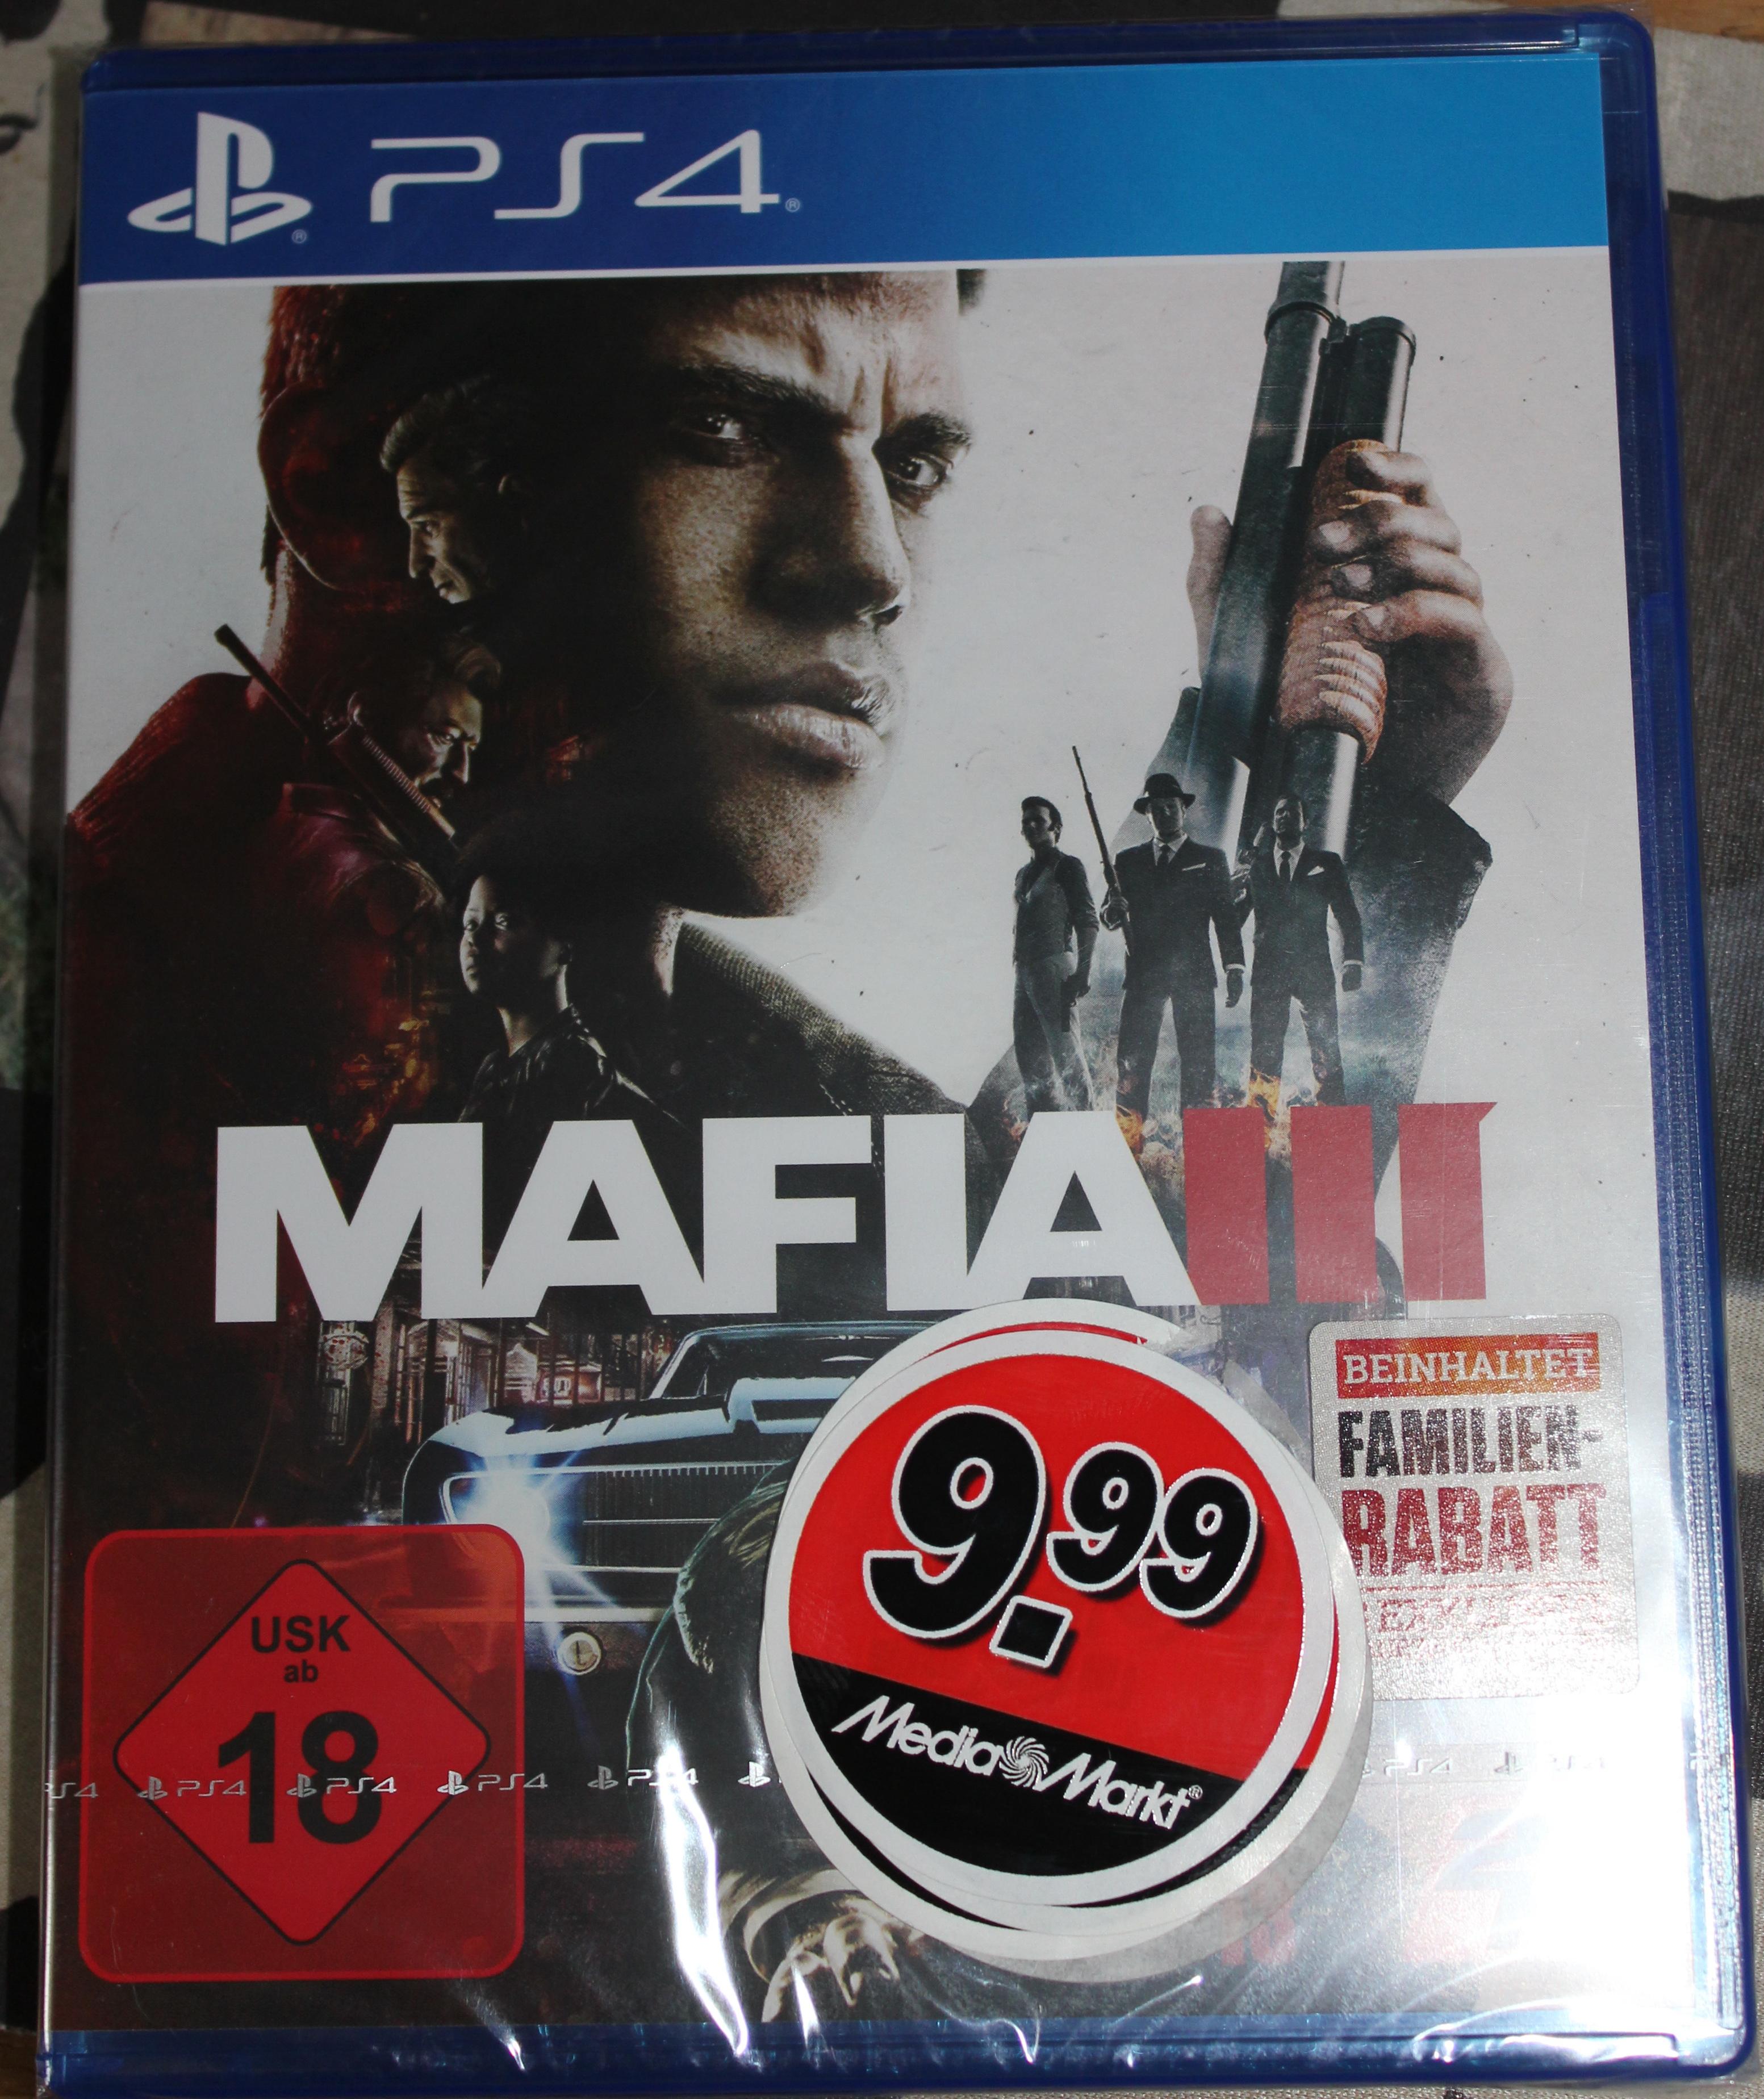 MAFIA 3 PS 4 für 9,99 € im Media-Markt MD-Bördepark